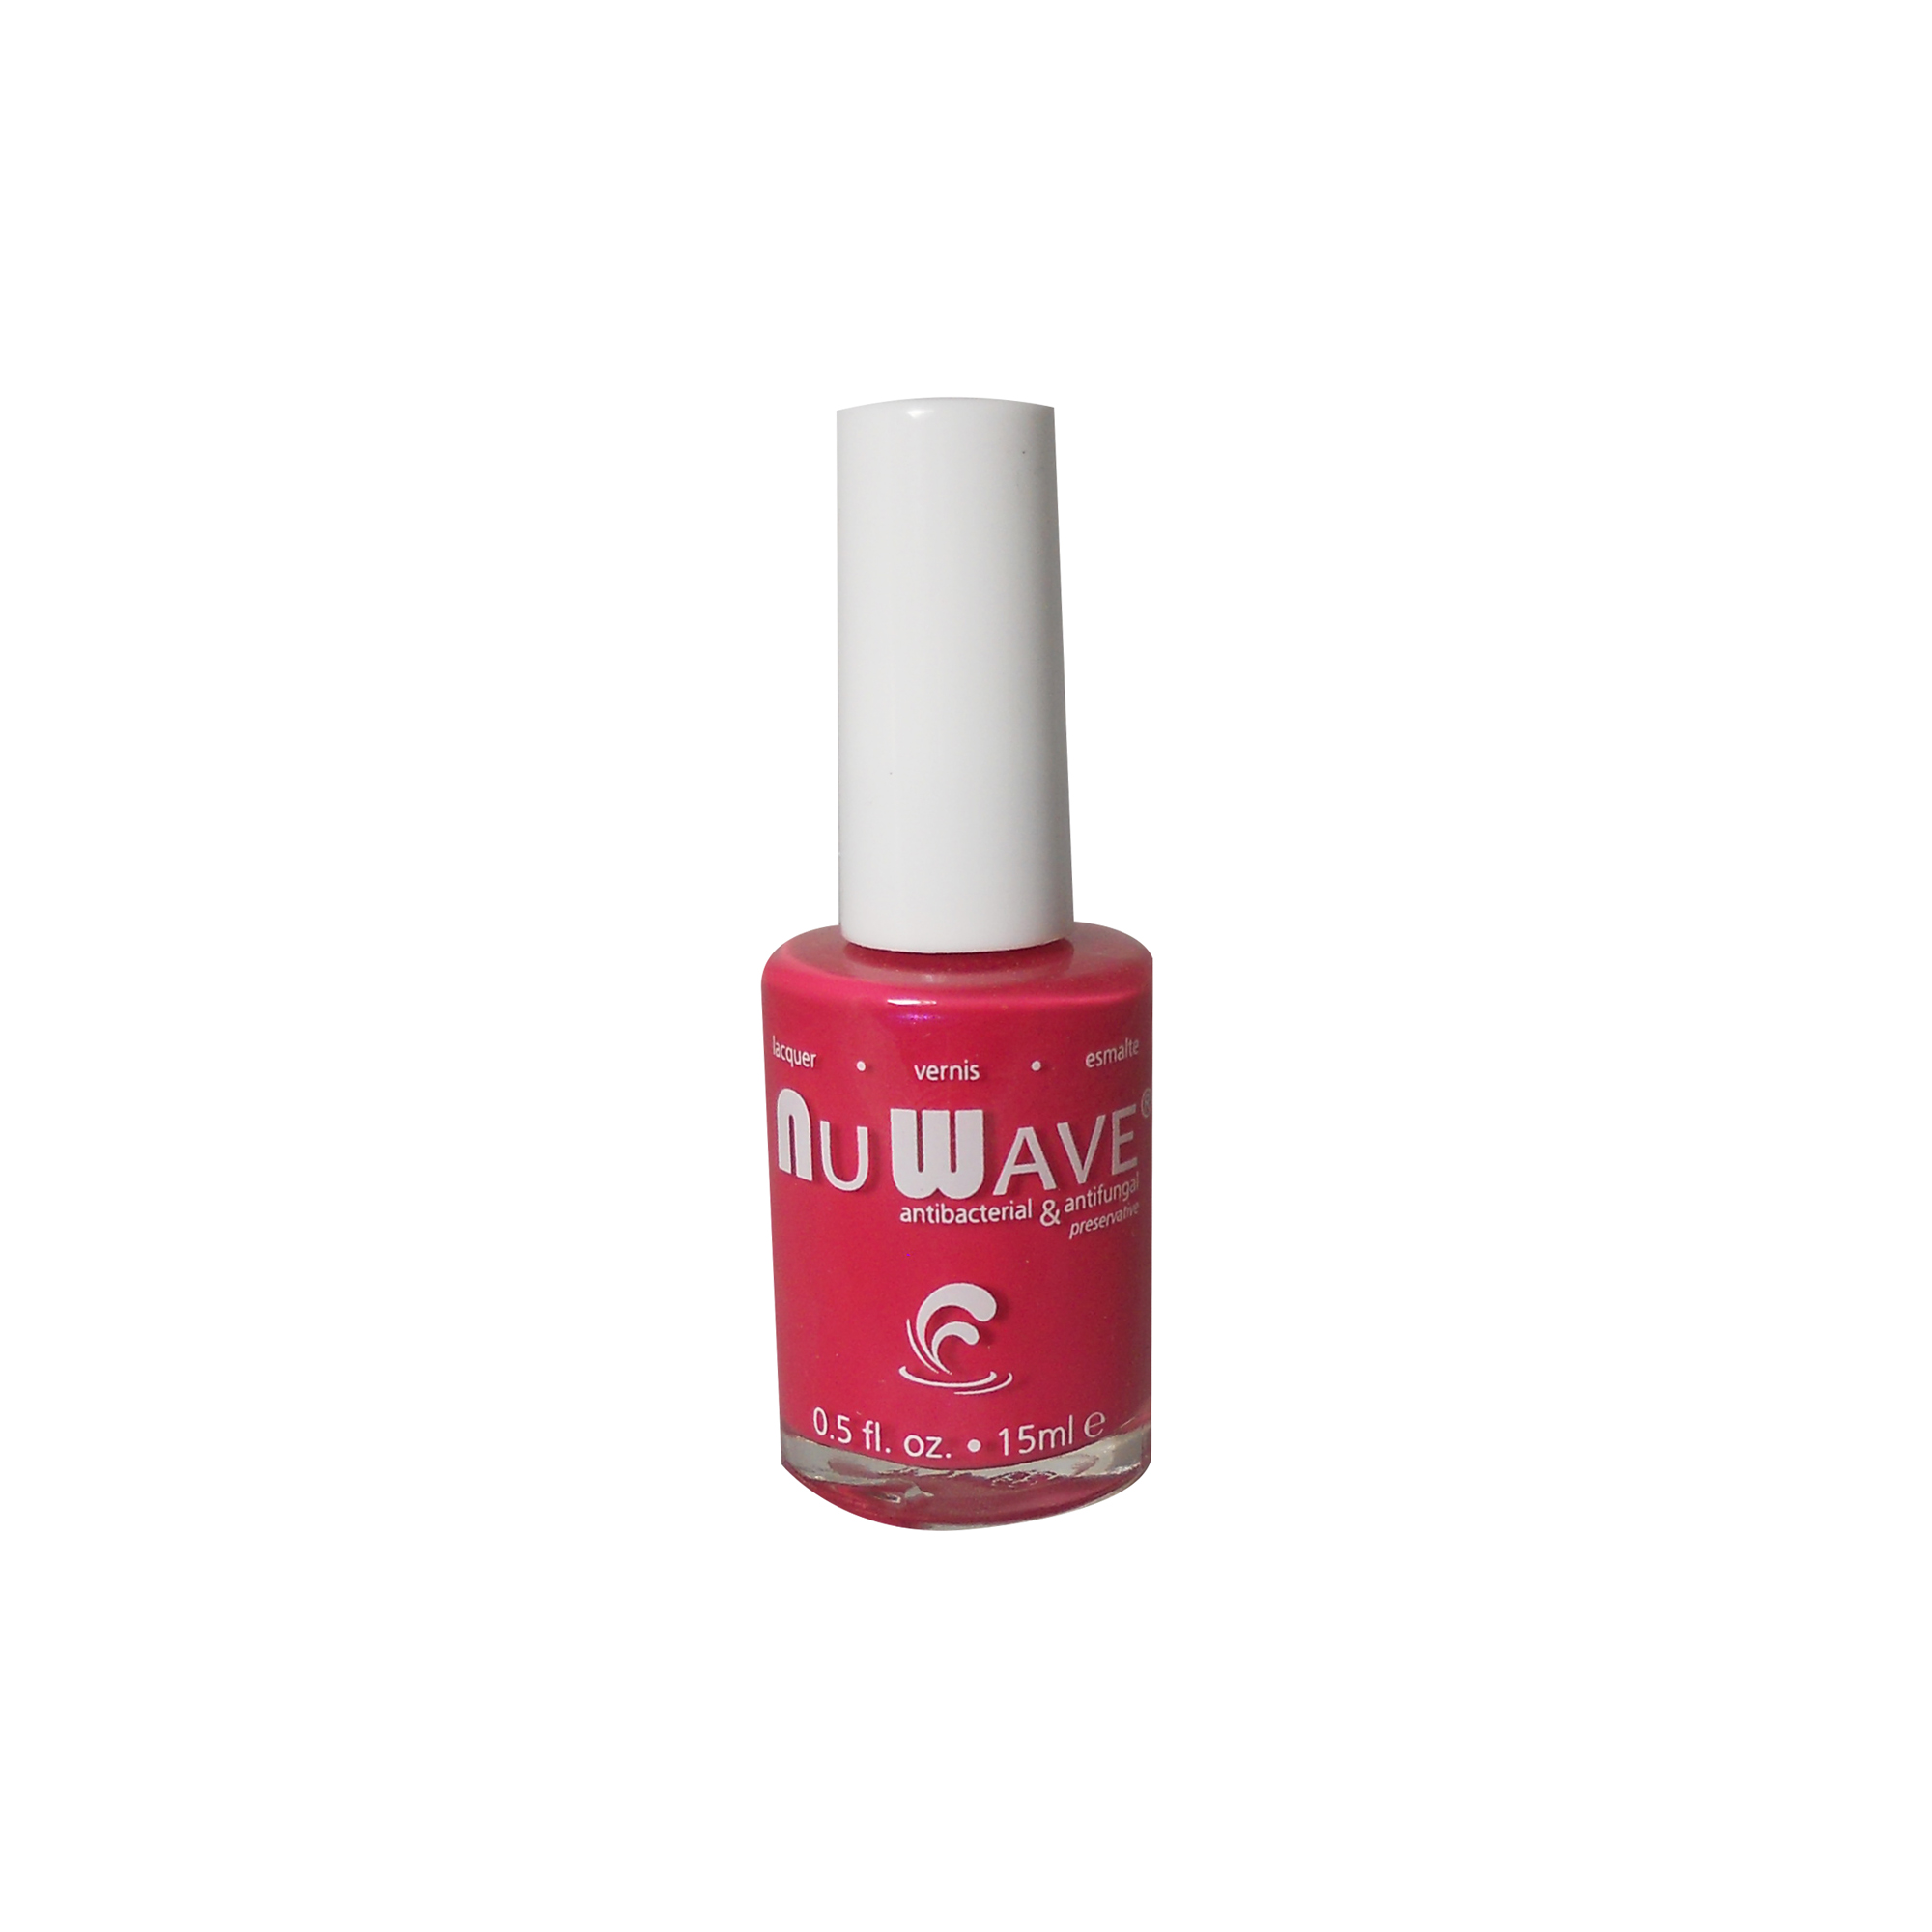 NuWave Antifungal Nail Polish, A15L,Shiny Hot Pink, Thaliana, .5 Fl ...